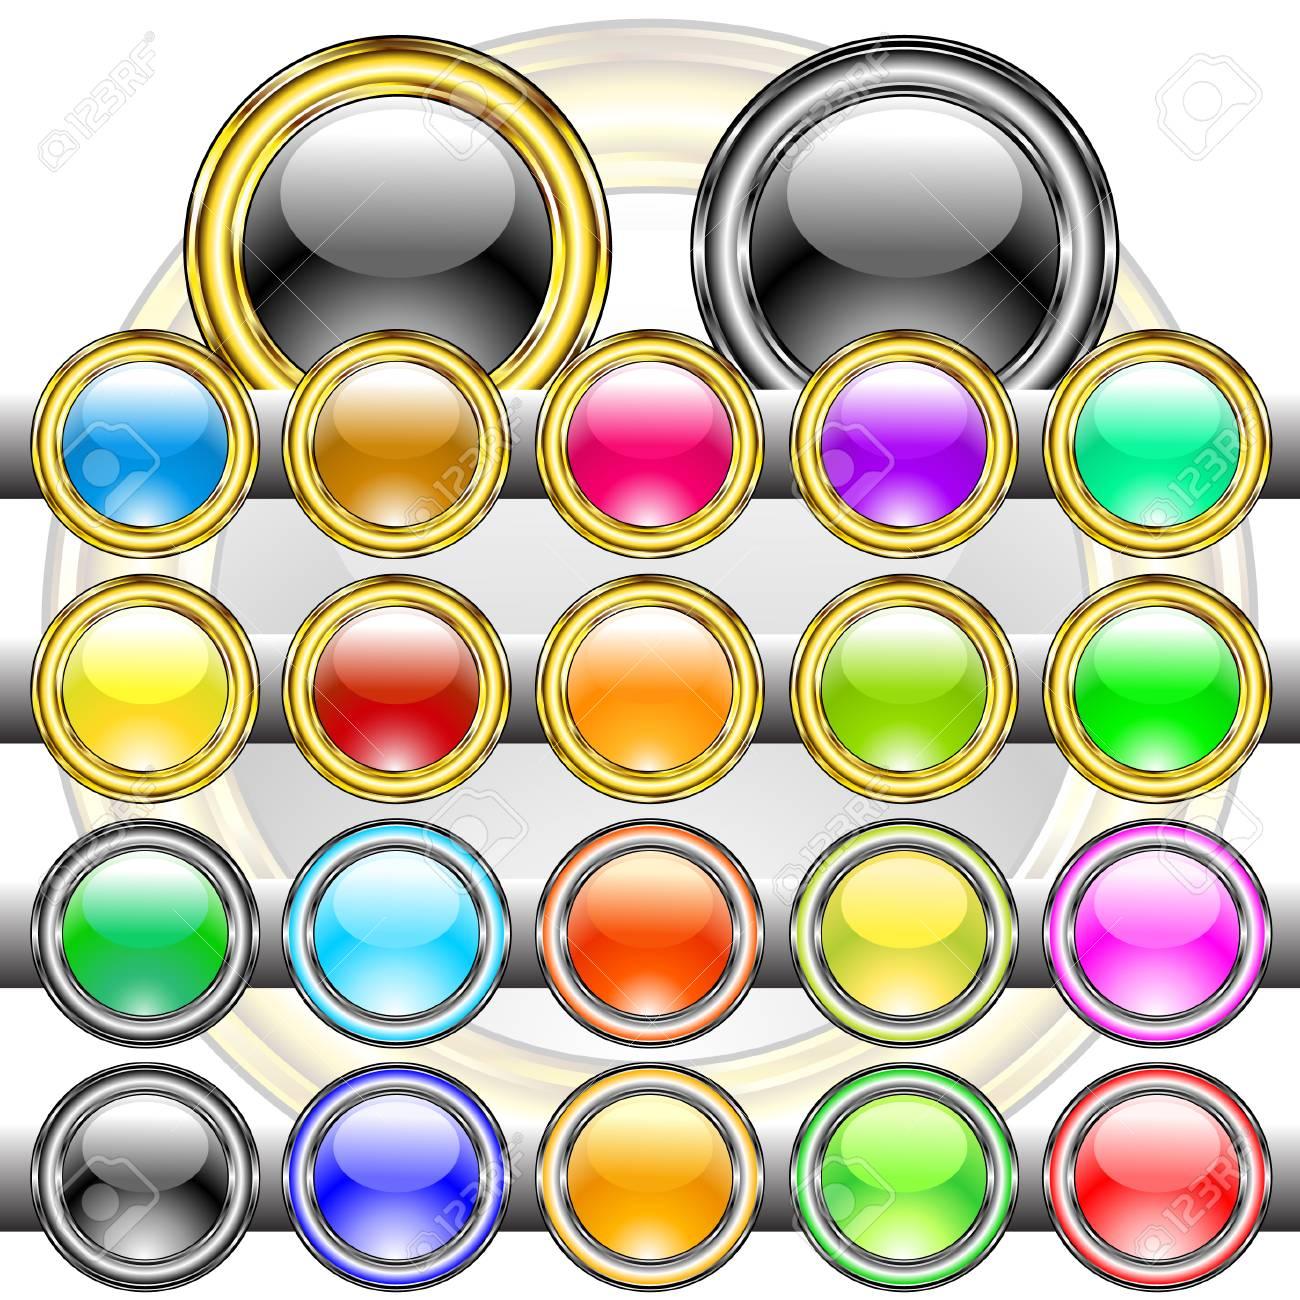 button colored Stock Vector - 5472197